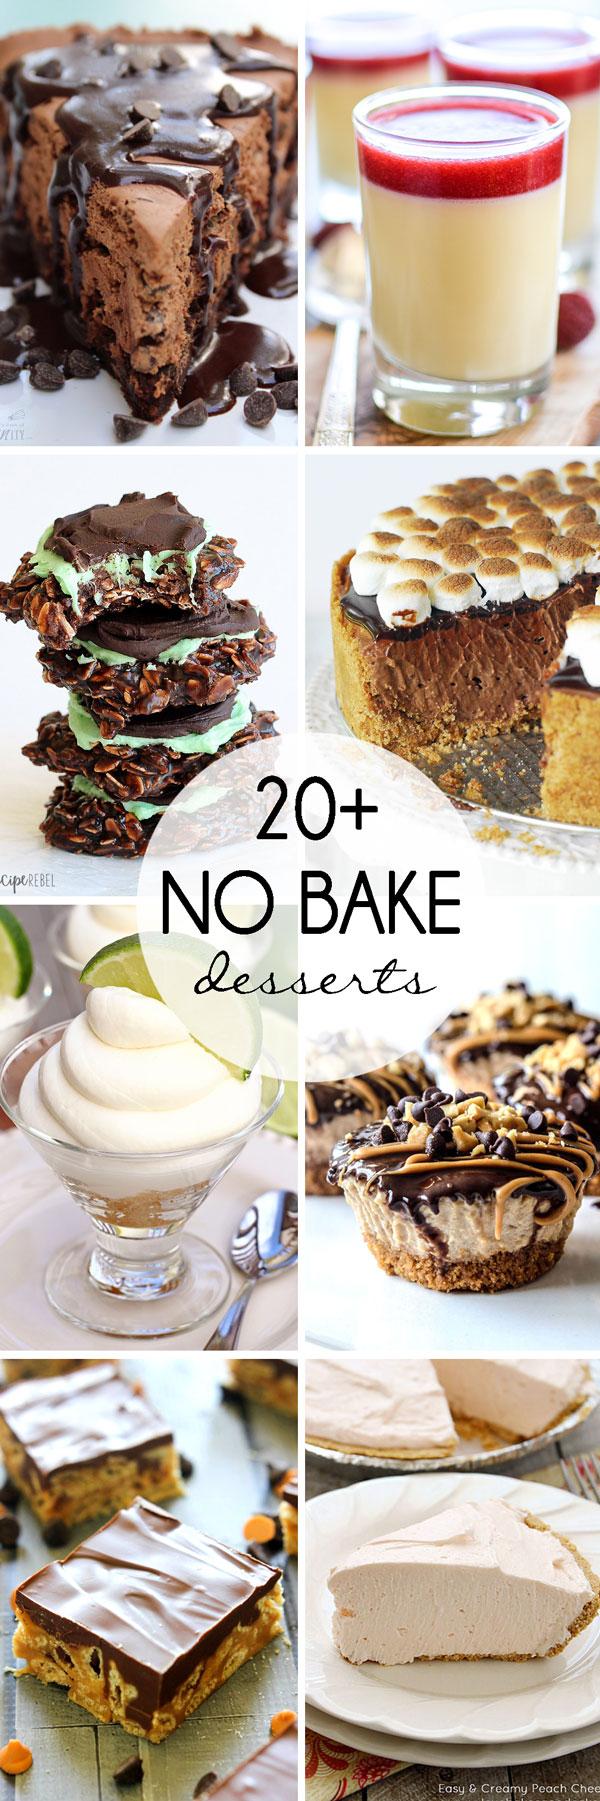 20+ No Bake Desserts.